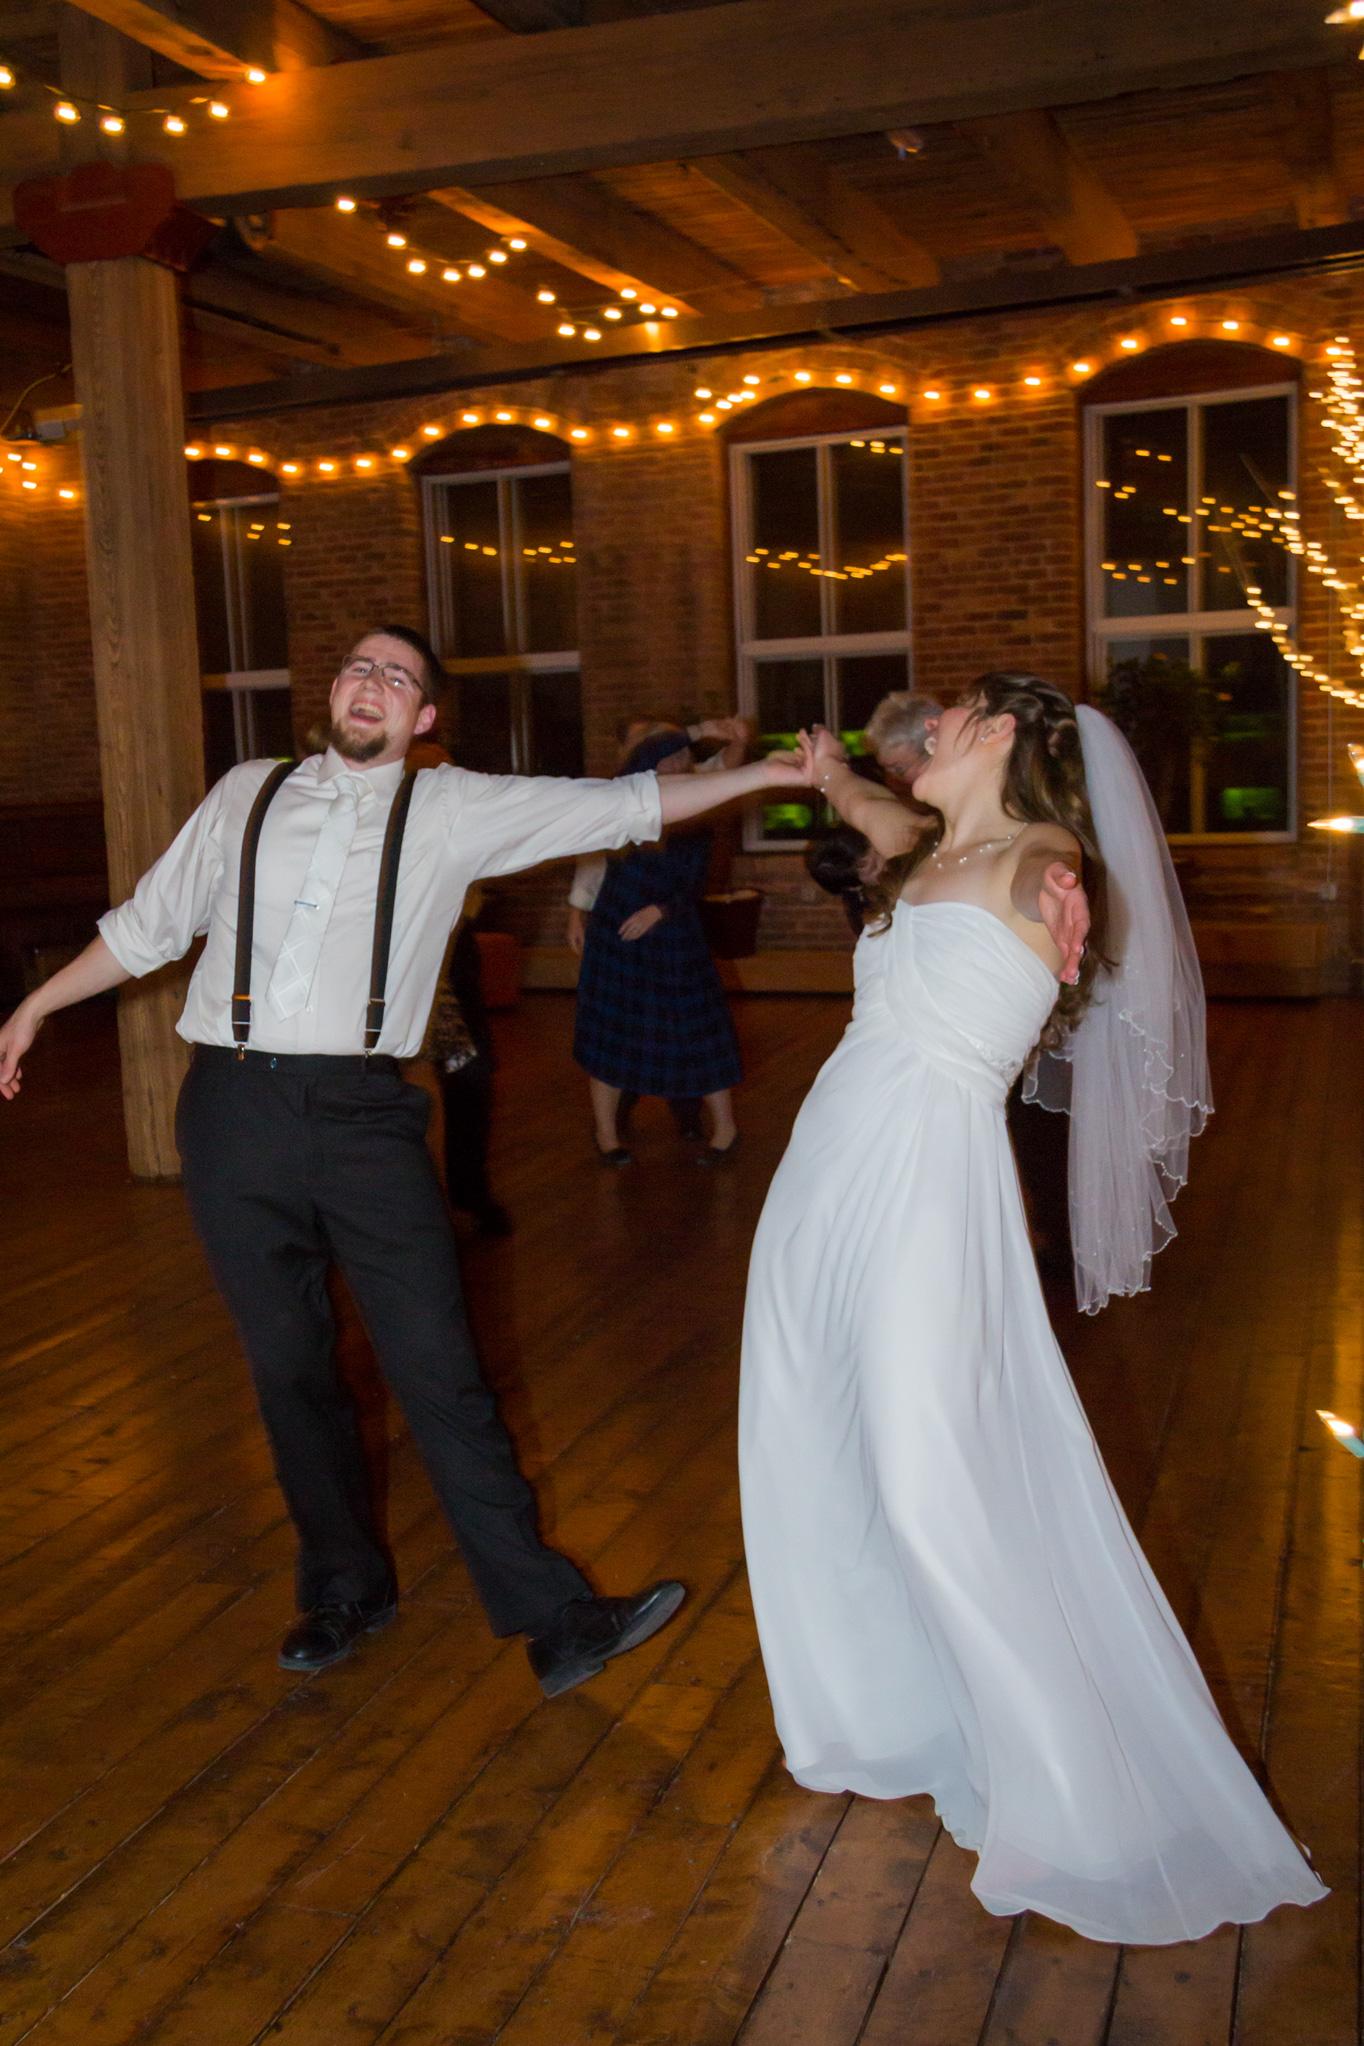 ben_sierra_wedding_dancing_-ring_reception_2.jpg